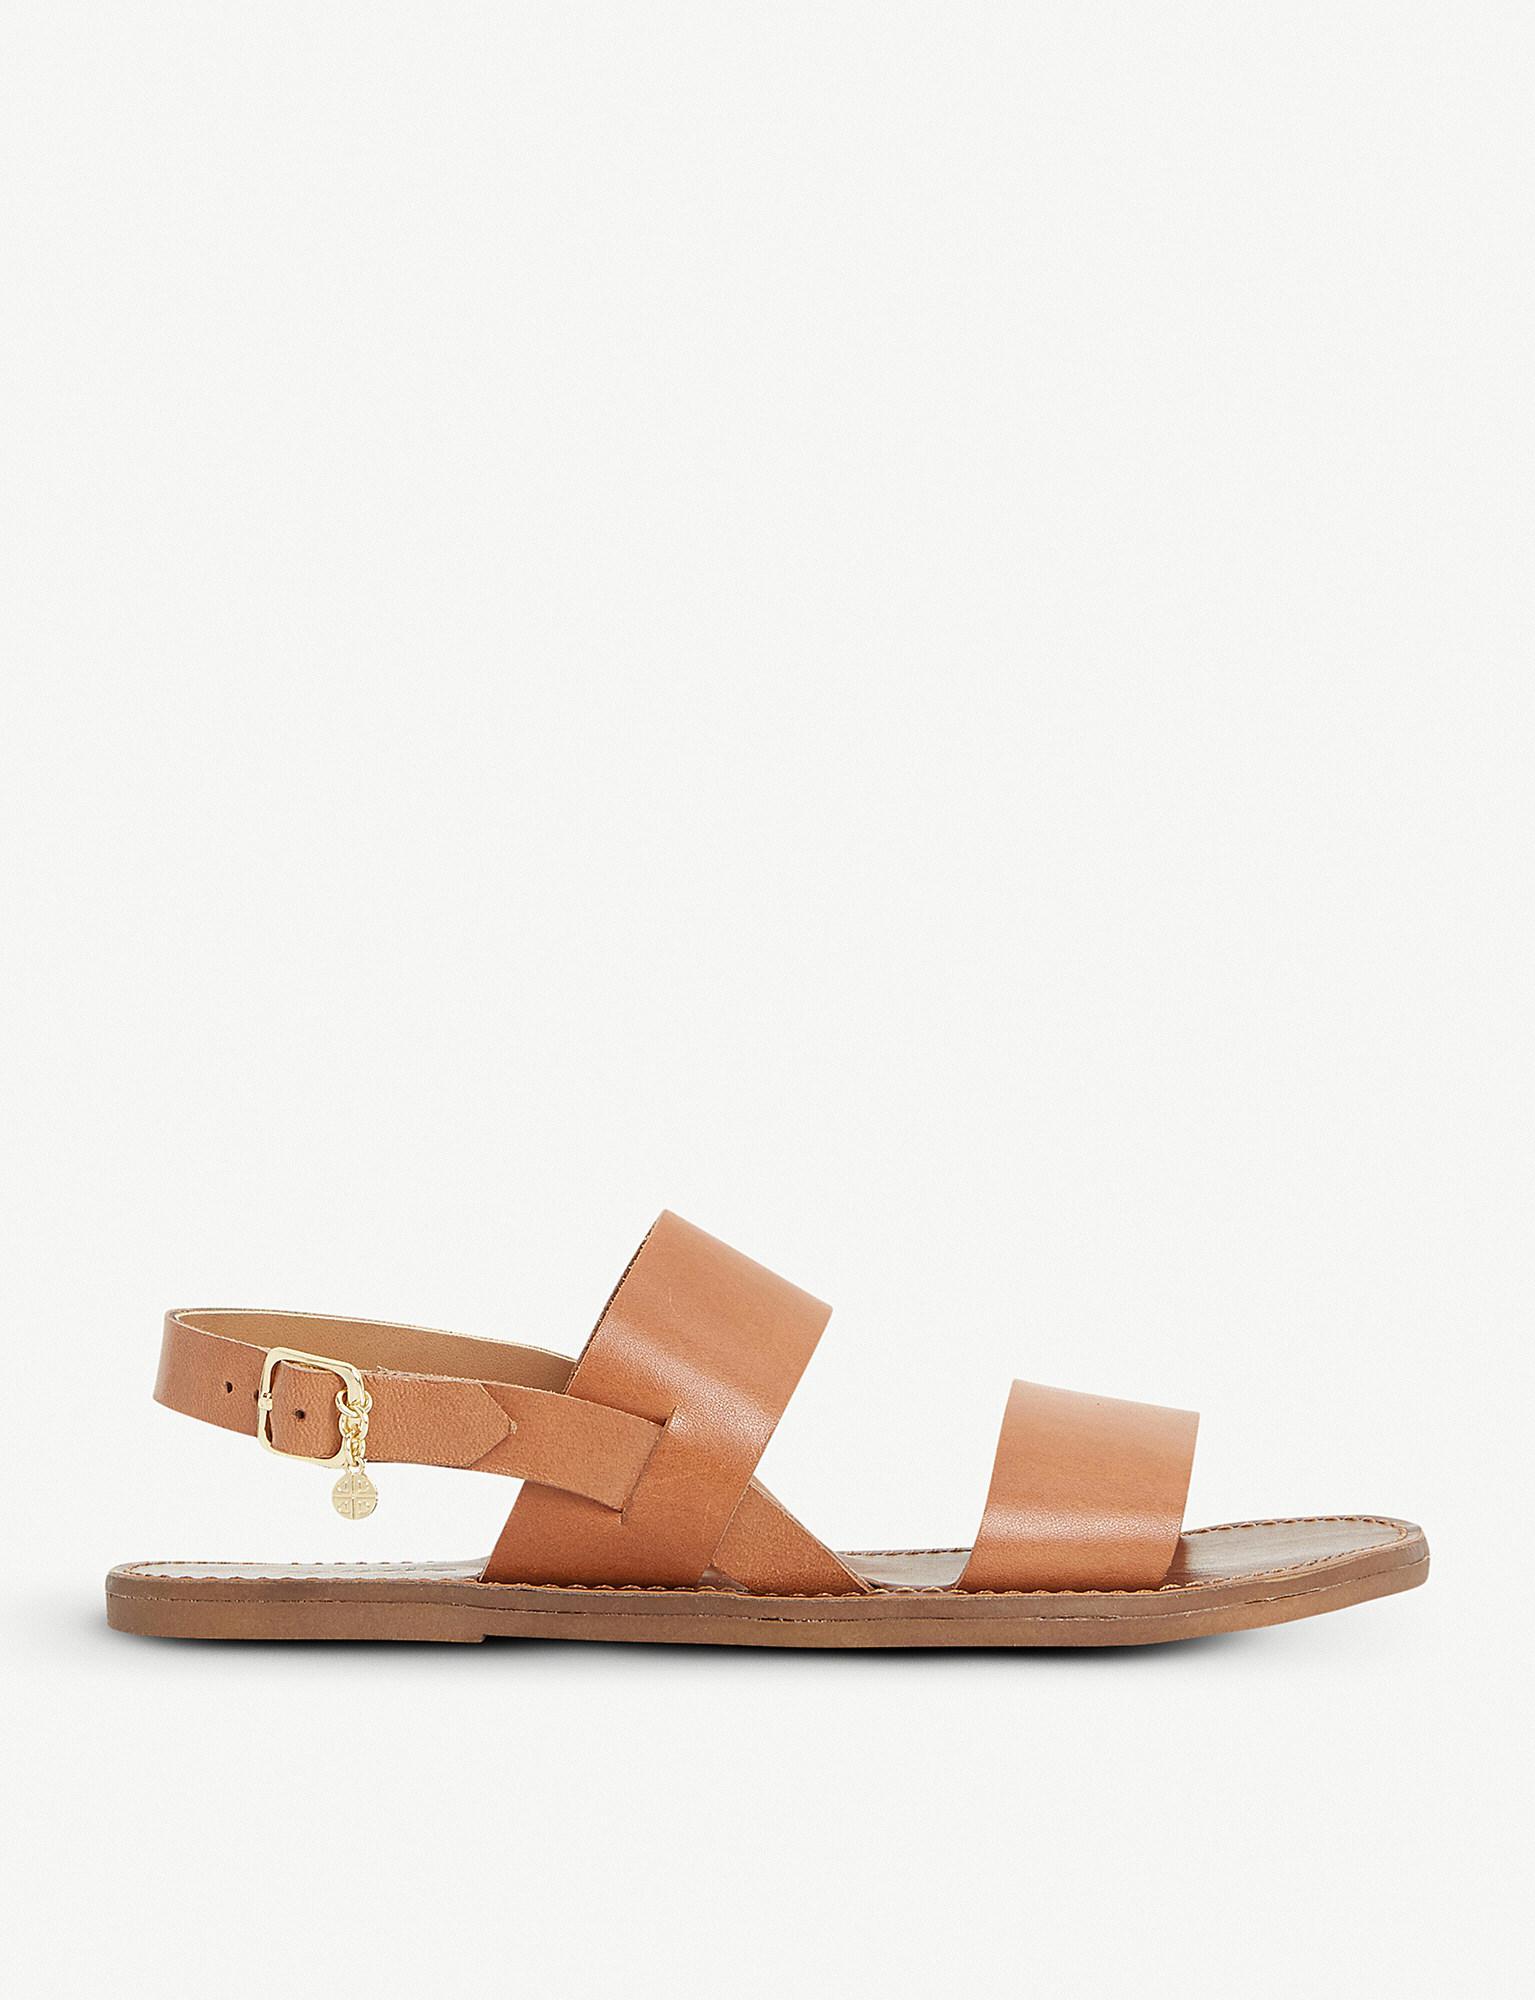 Dune Lowpez Leather Flat Sandal CtomYz8tnQ